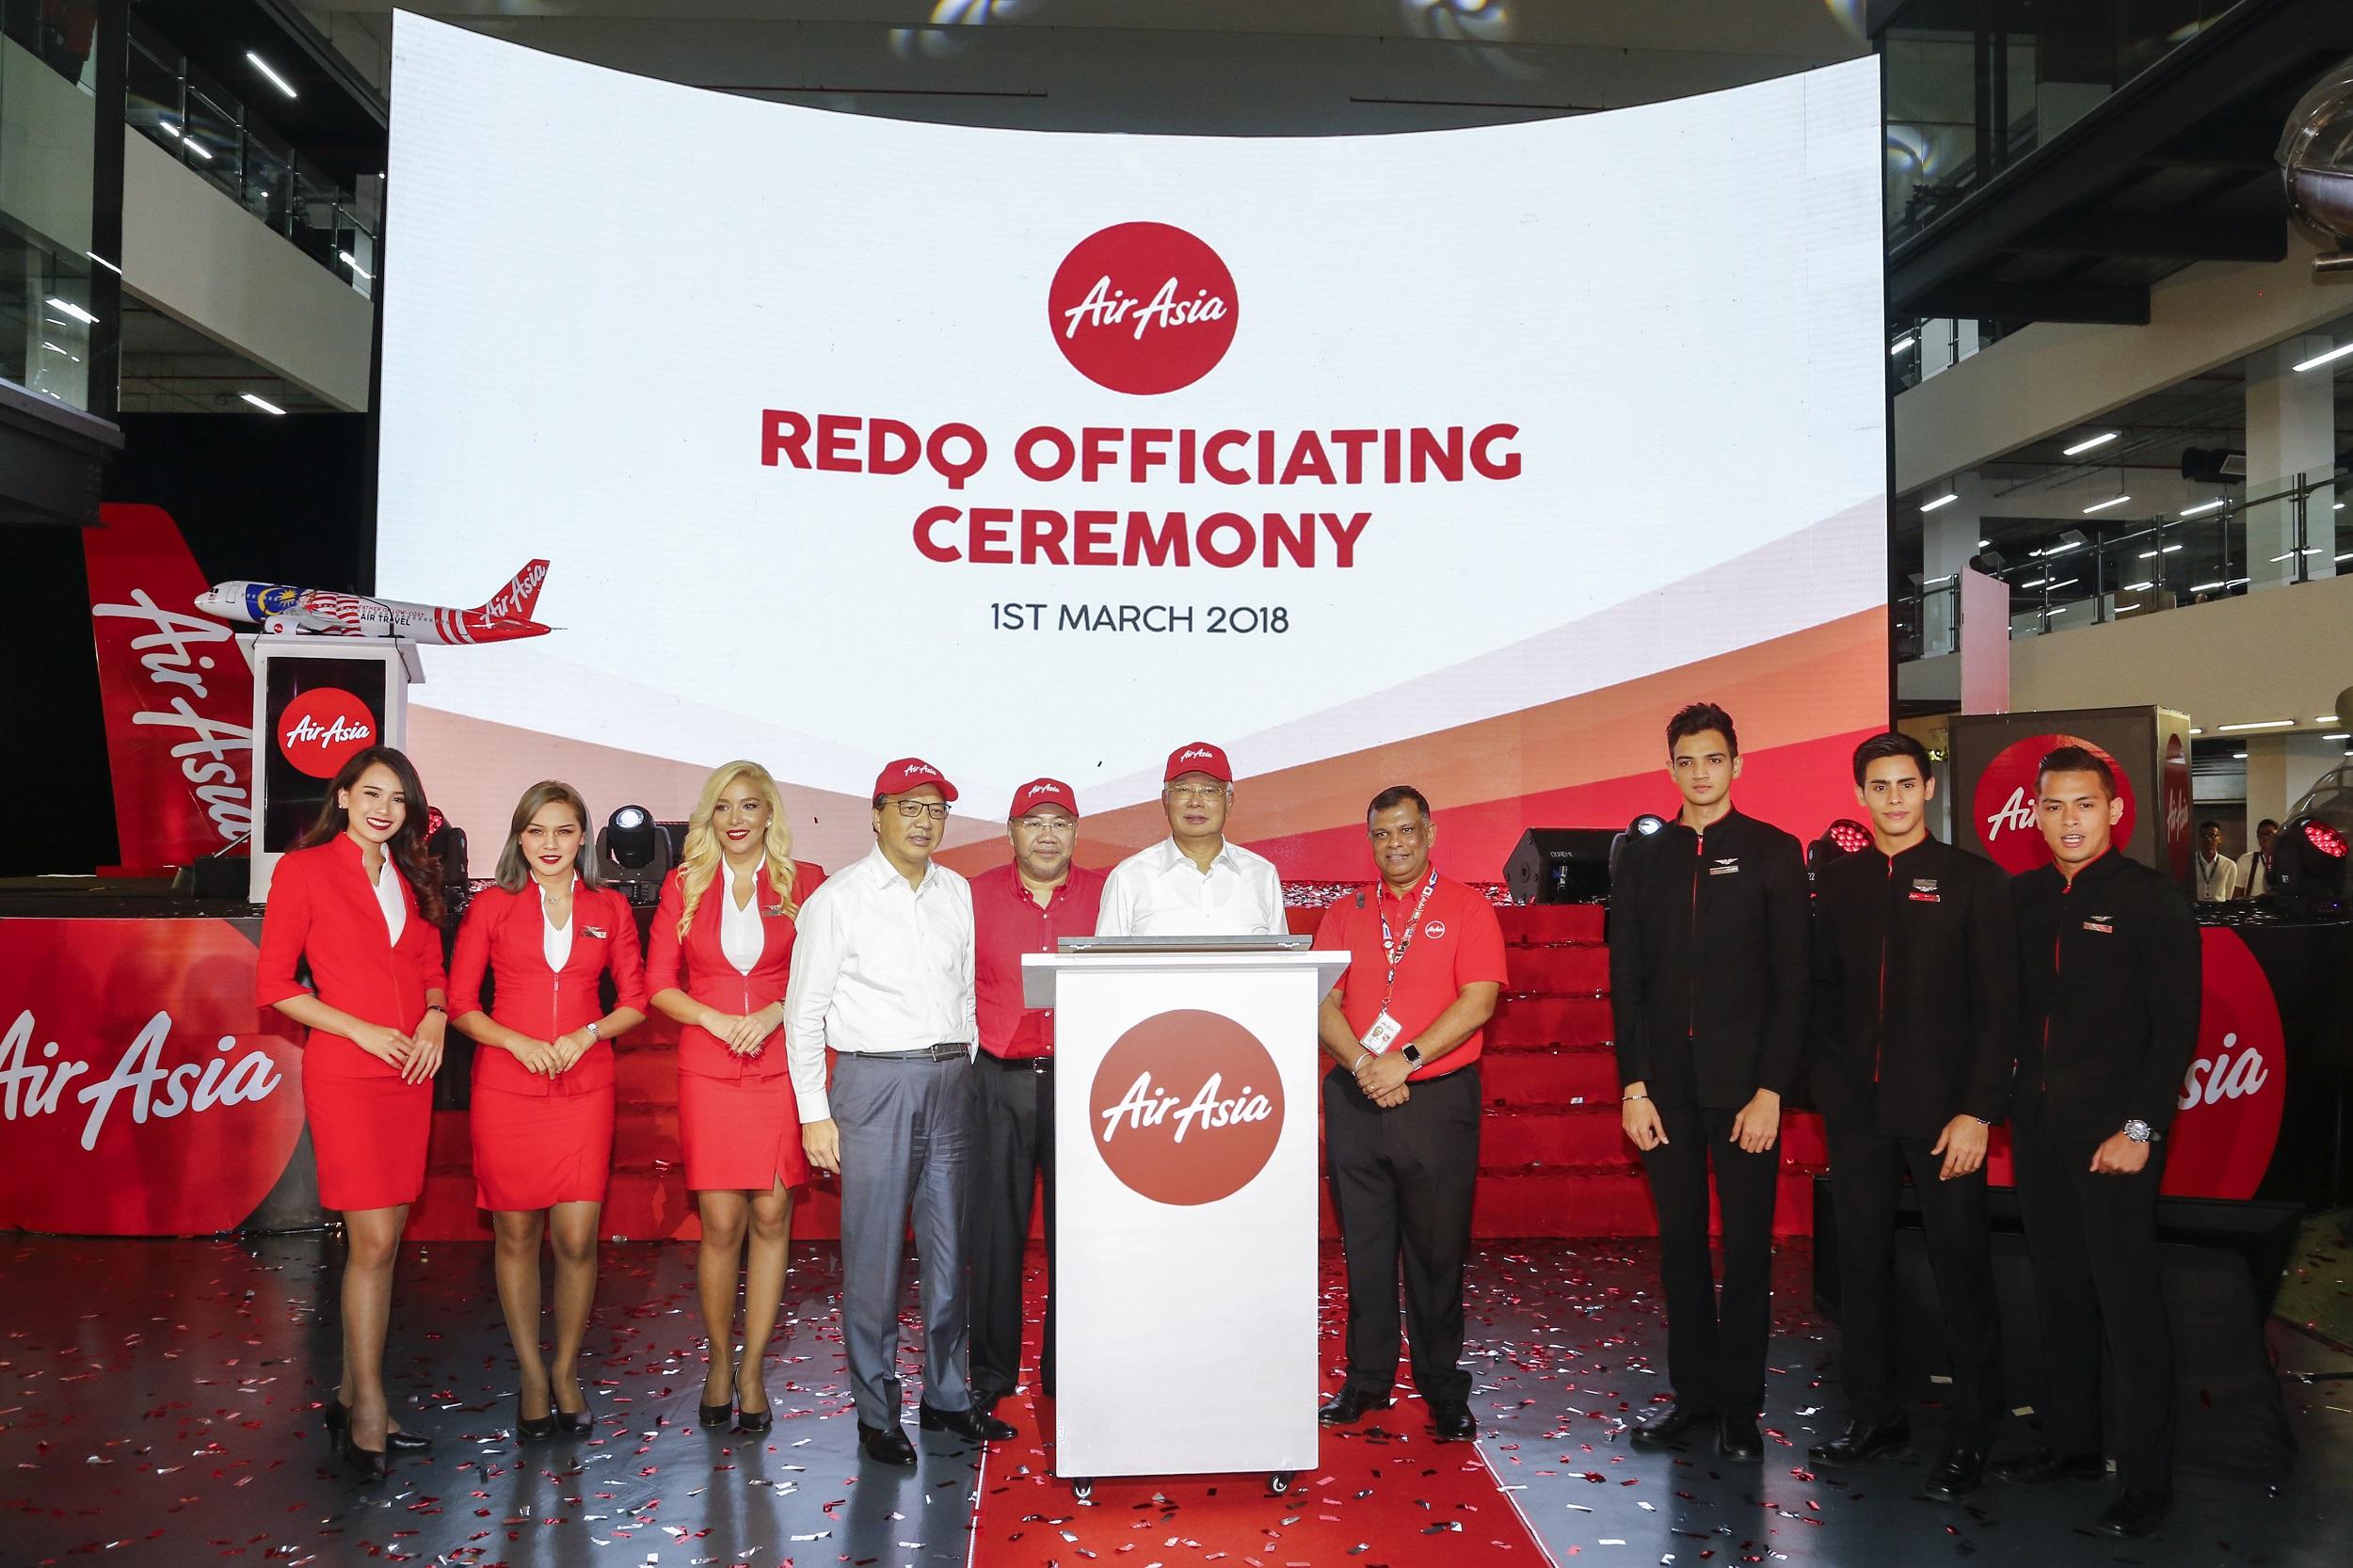 YAB Dato' Sri Mohd Najib Bin Tun Haji Abdul Razak, Prime Minister of Malaysia, officiating the AirAsia RedQ headquarters together with YB Dato' Sri Liow Tiong Lai, Minister of Transport;Datuk Kamarudin Meranun, Executive Chairman of AirAsia Berhad & Group CEO of AirAsia X; and Tan Sri Tony Fernandes, Group CEO of AirAsia & Co-Group CEO of AirAsia X.